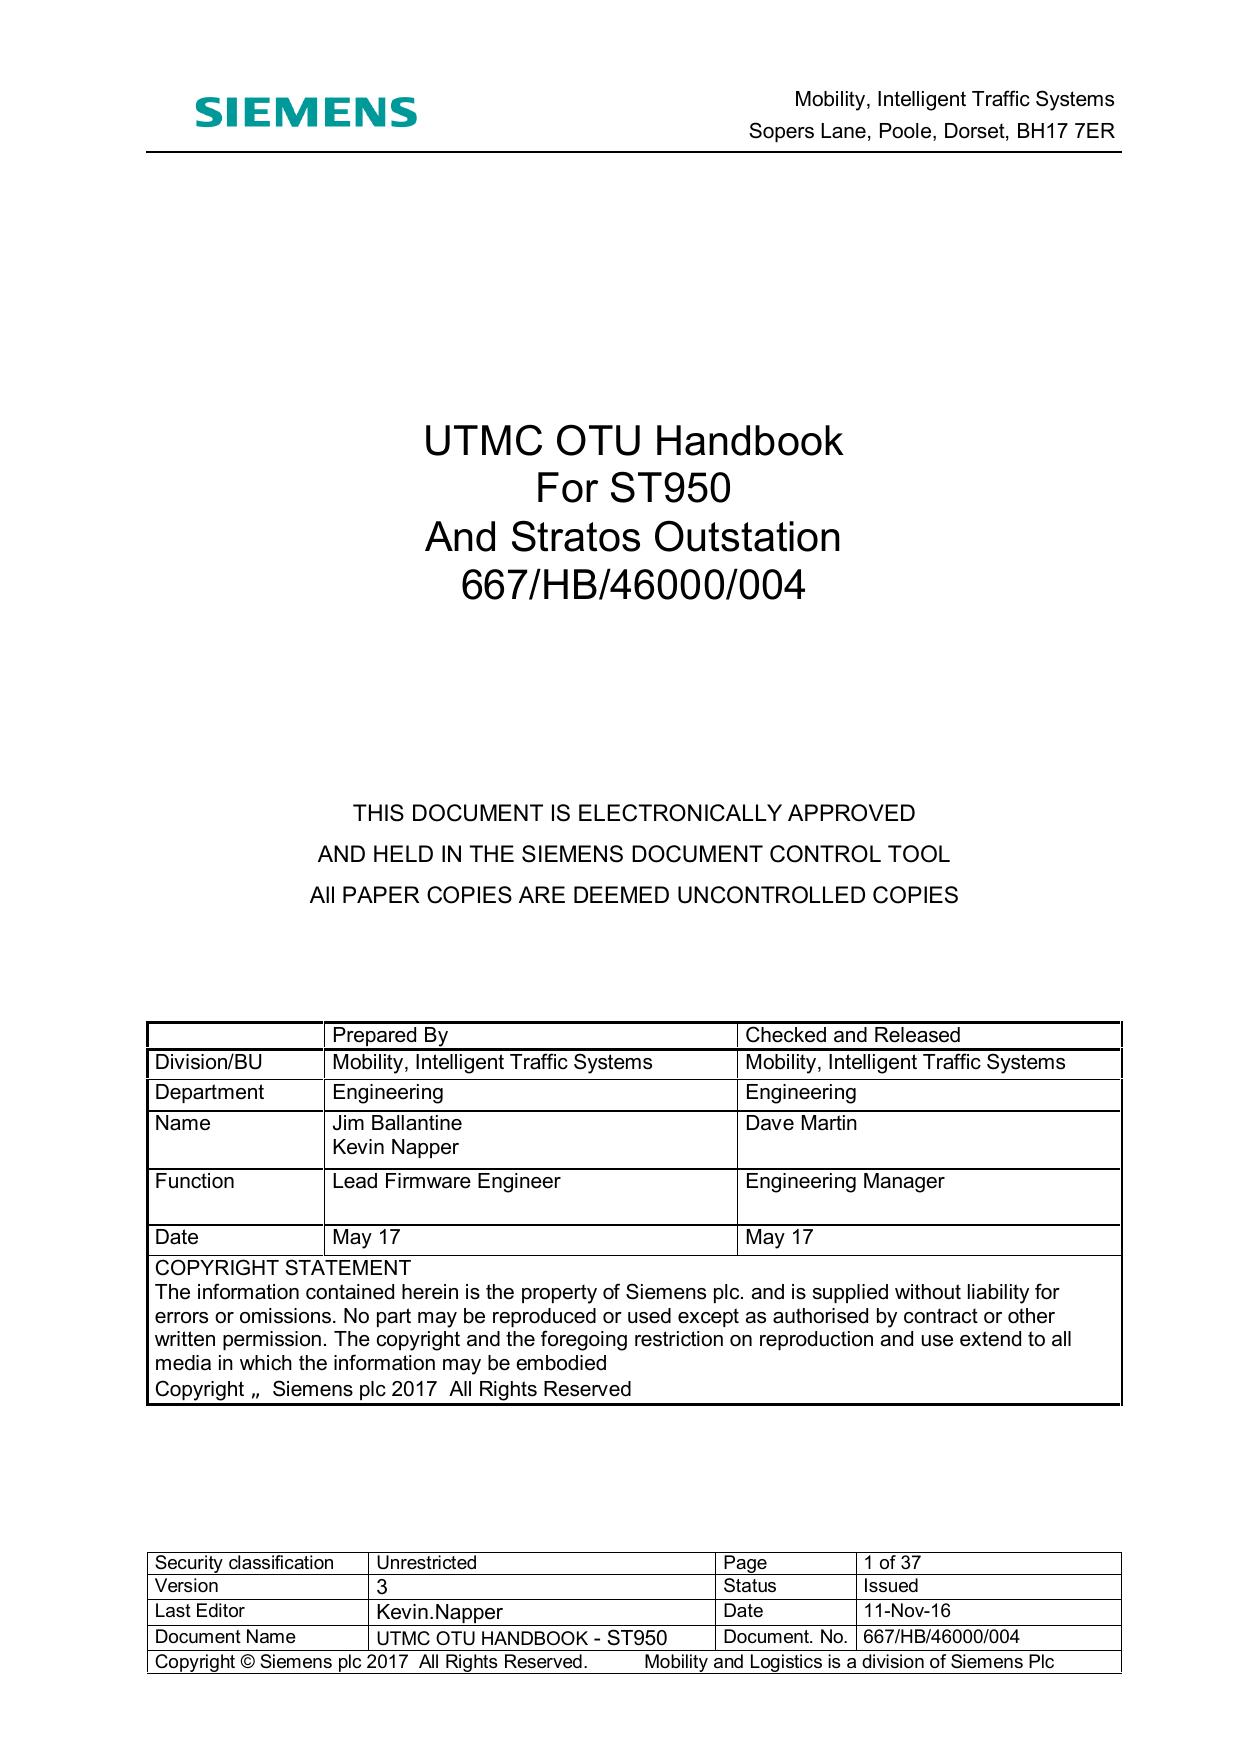 utmc otu handbook - st950 | manualzz com